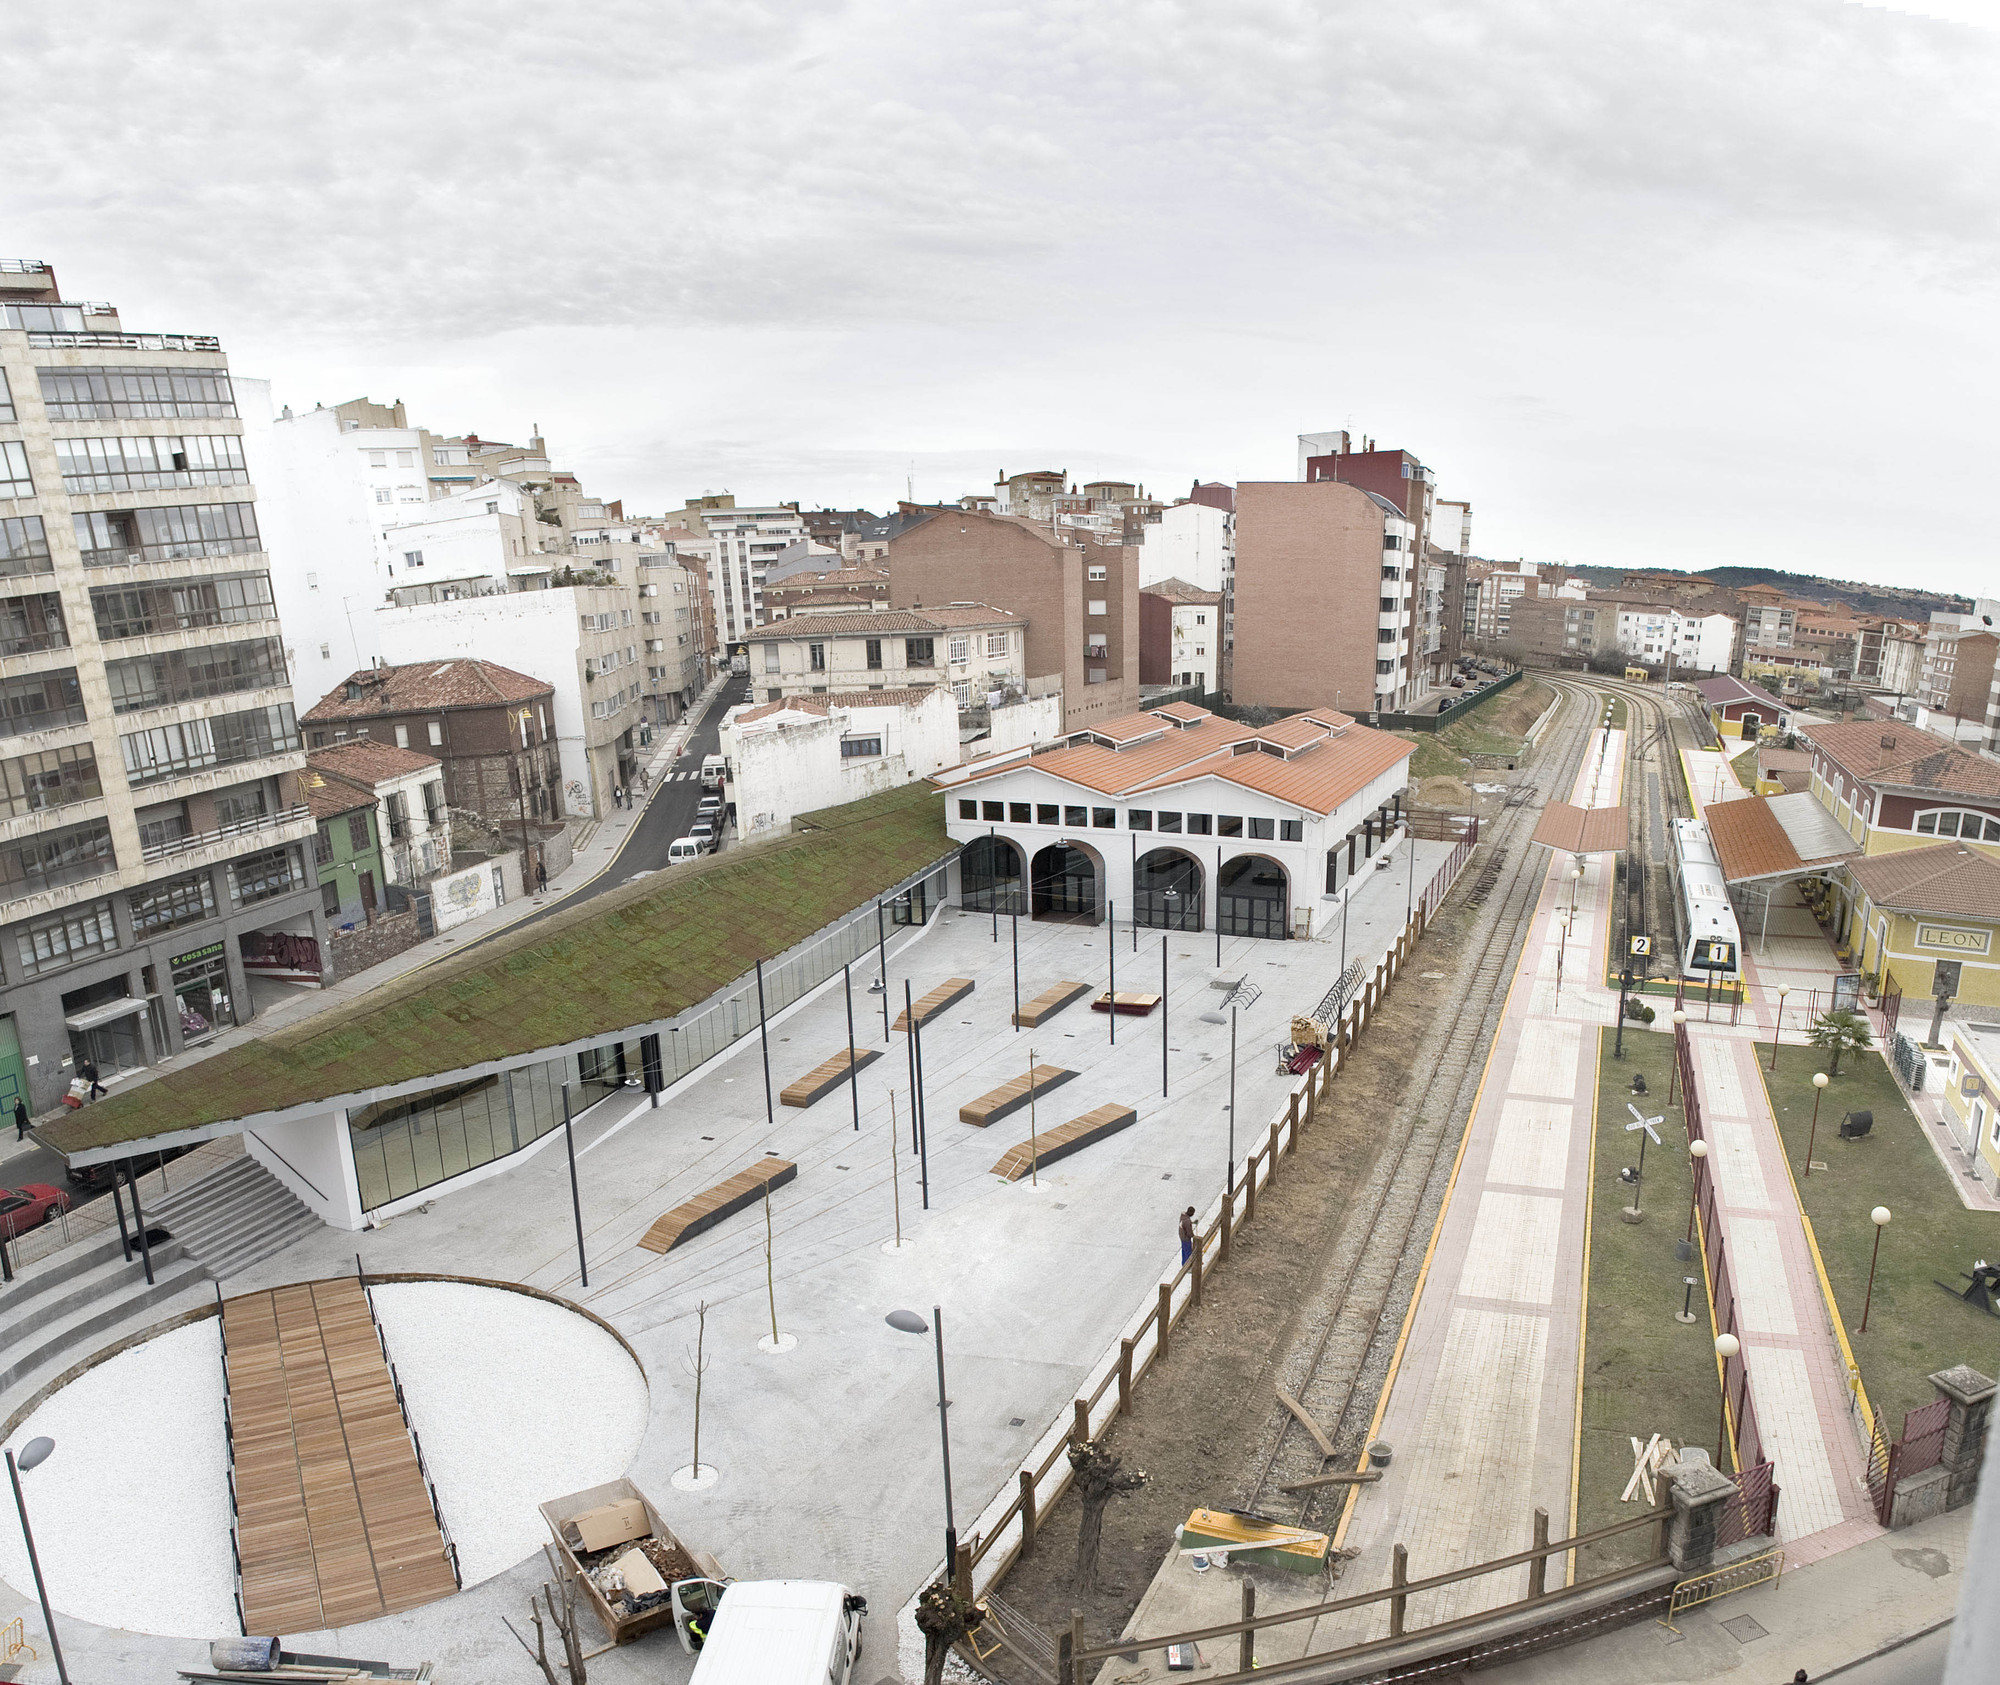 Vias Cultural Center / Estudio SIC, © Esaú Acosta